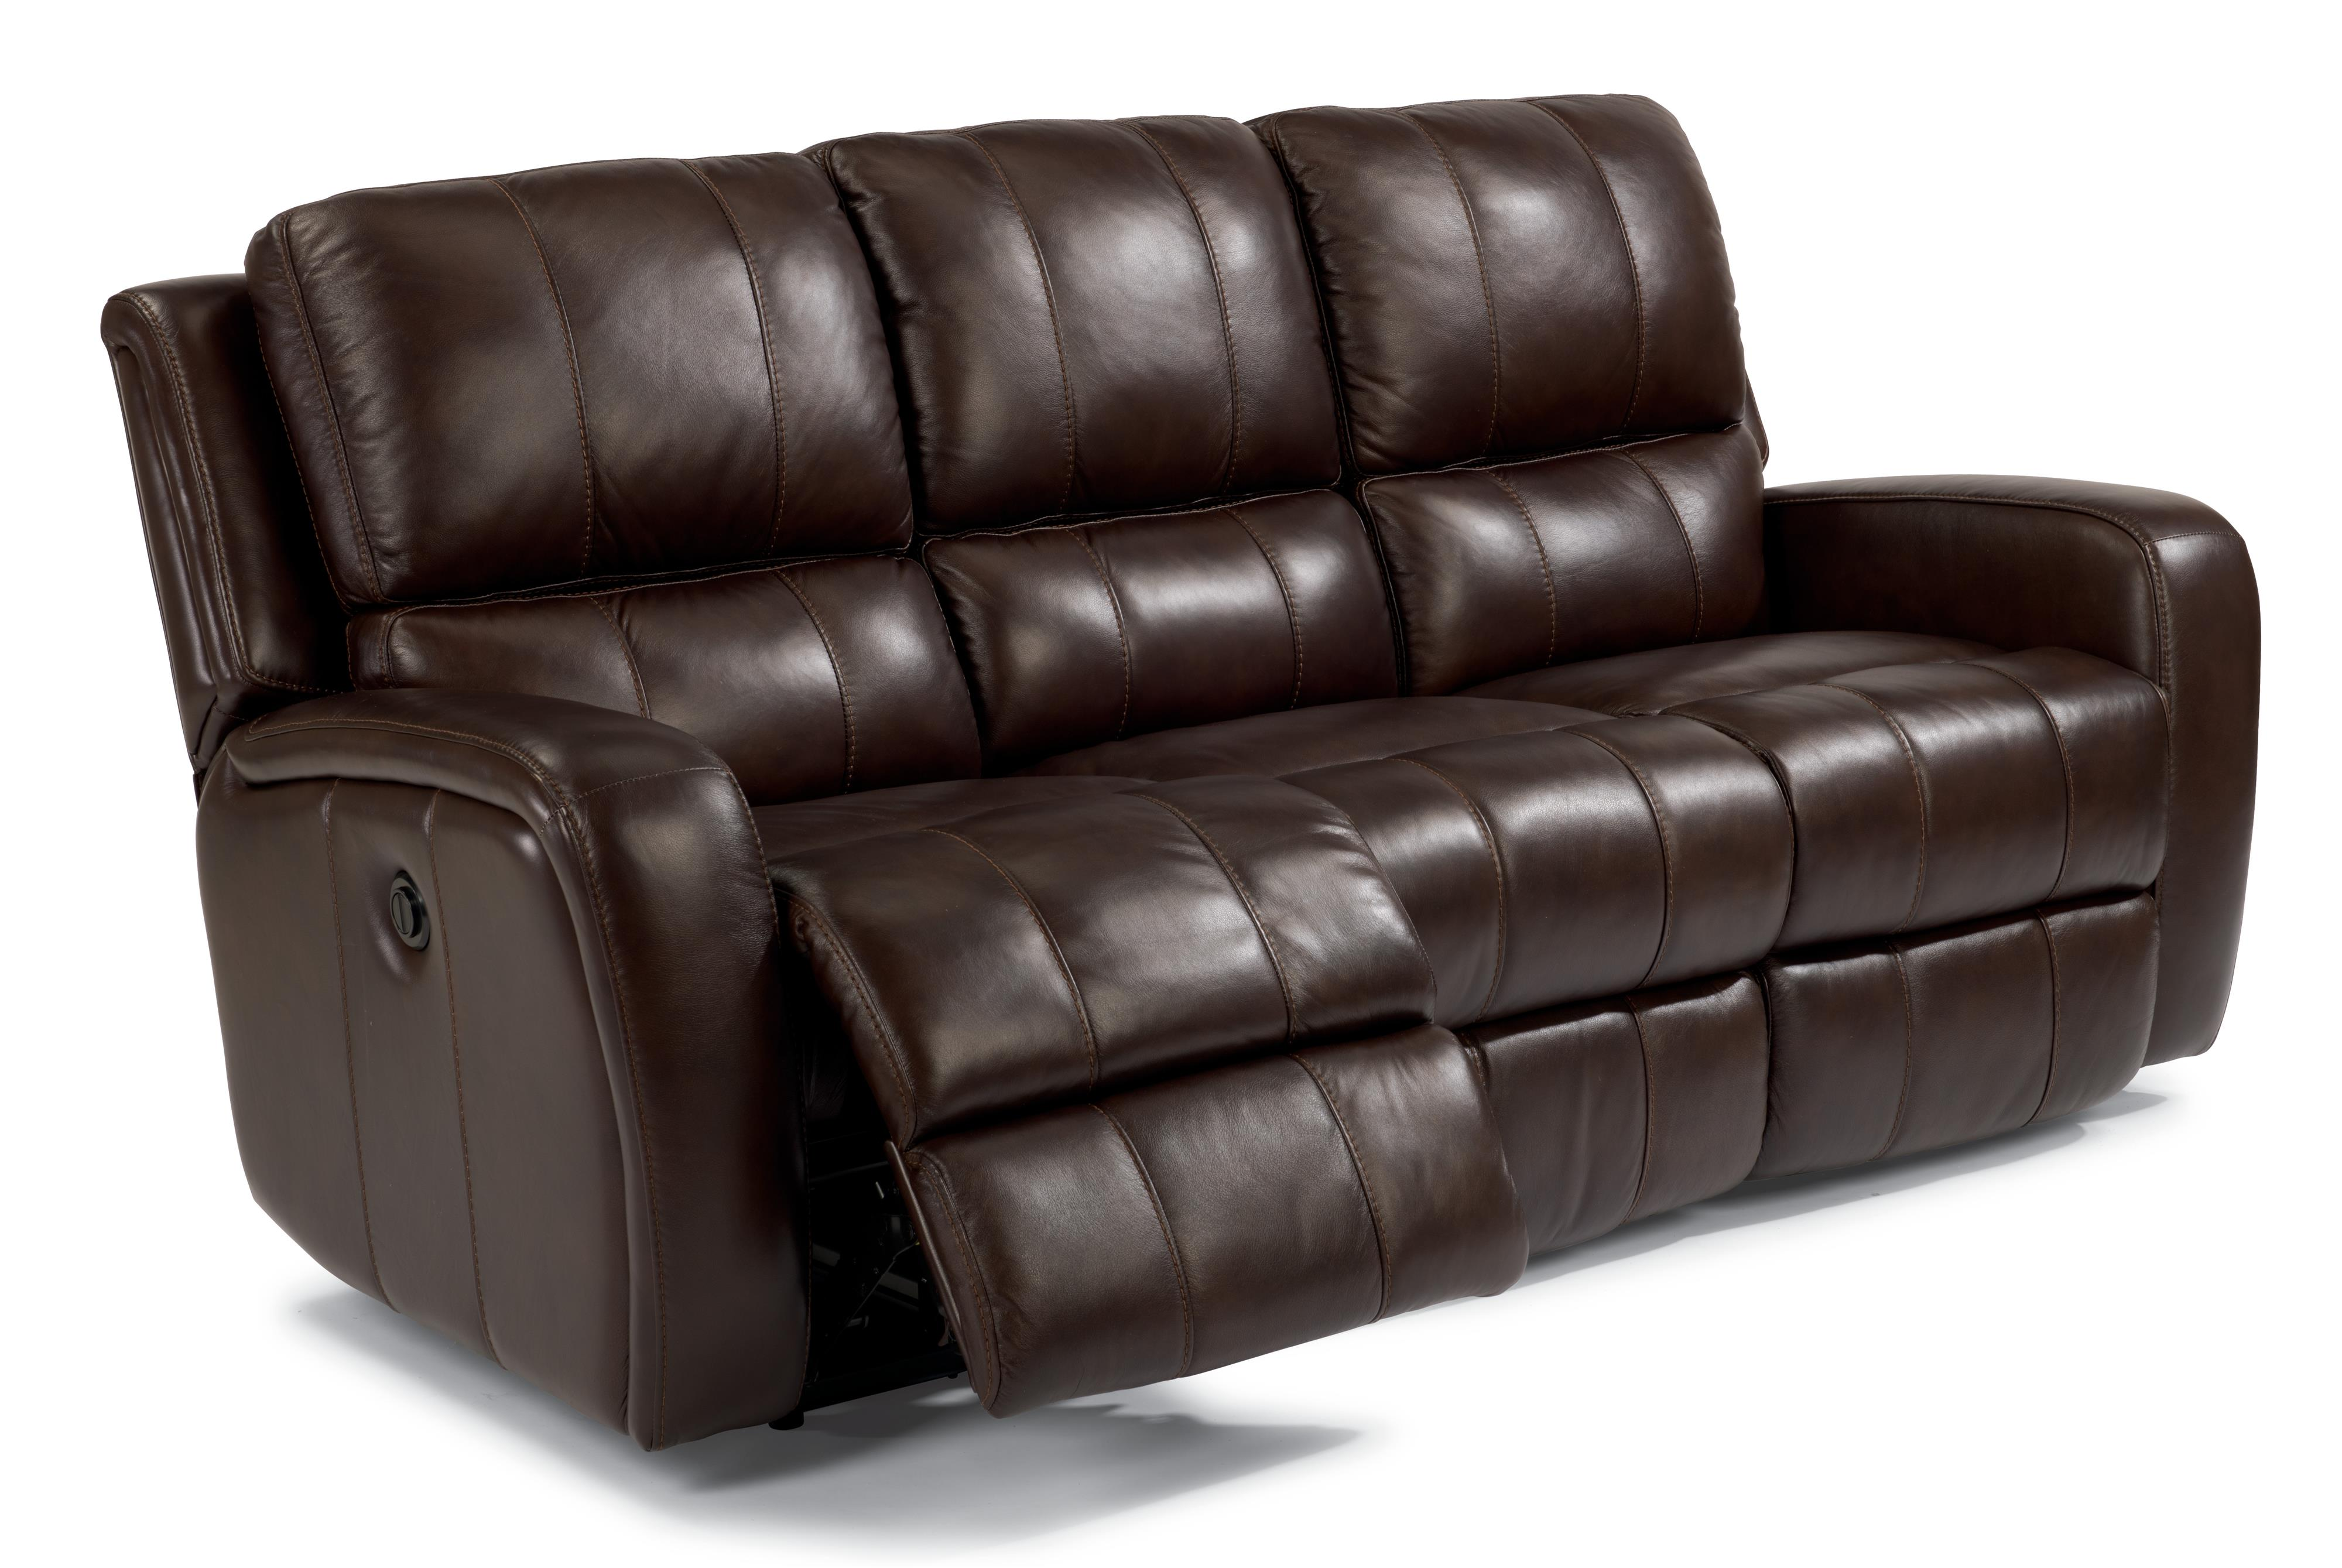 flexsteel capitol double reclining sofa fabric change toronto latitudes hammond casual